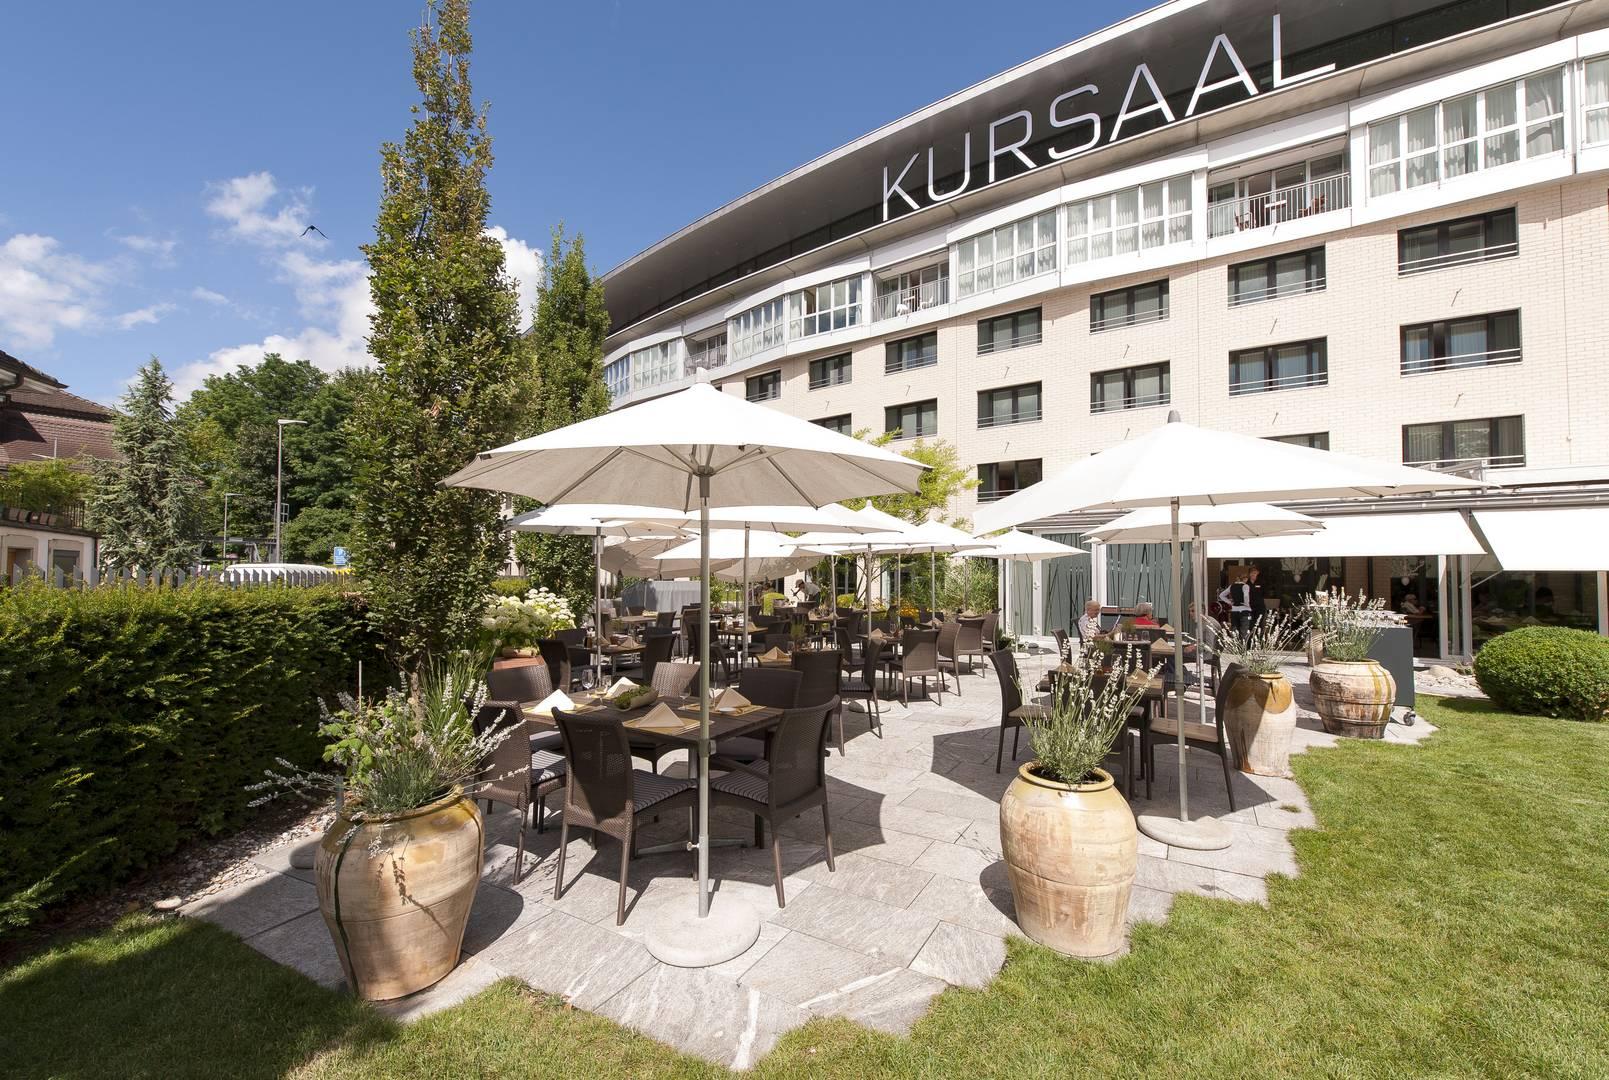 Kursaal Casino Bern